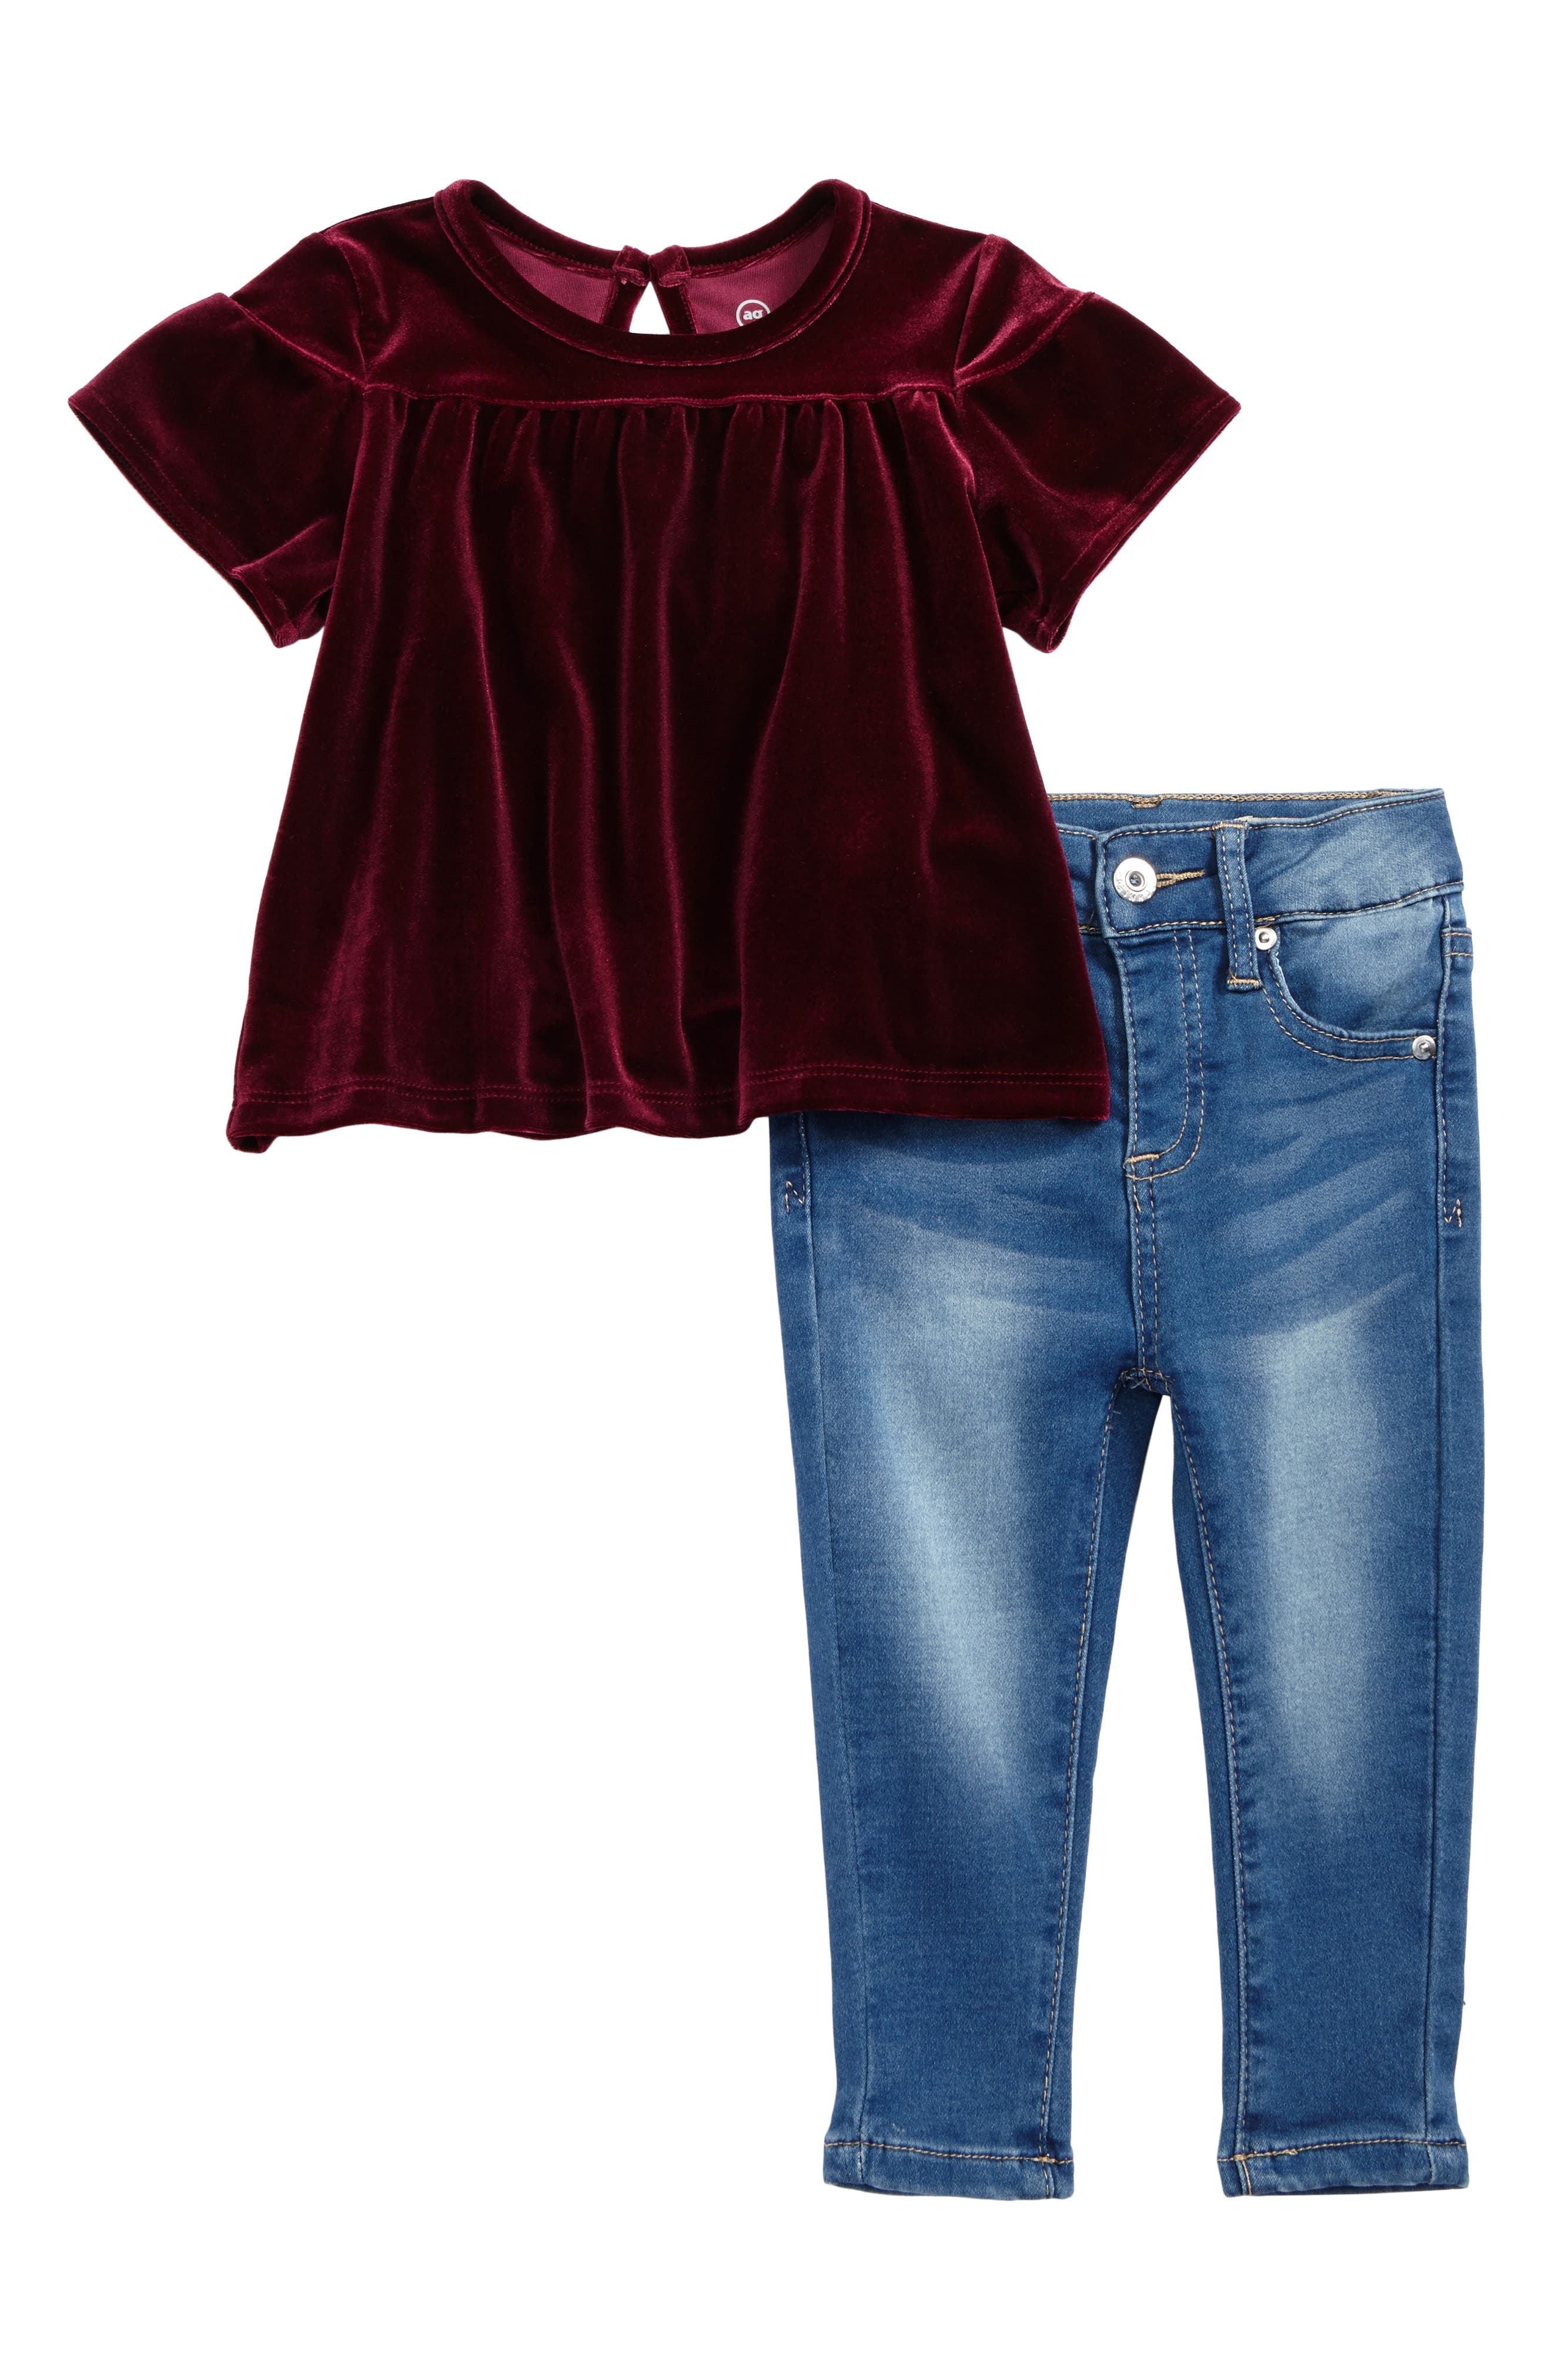 ag adriano goldschmied kids Velvet Top & Knit Jeans Set (Baby Girls)